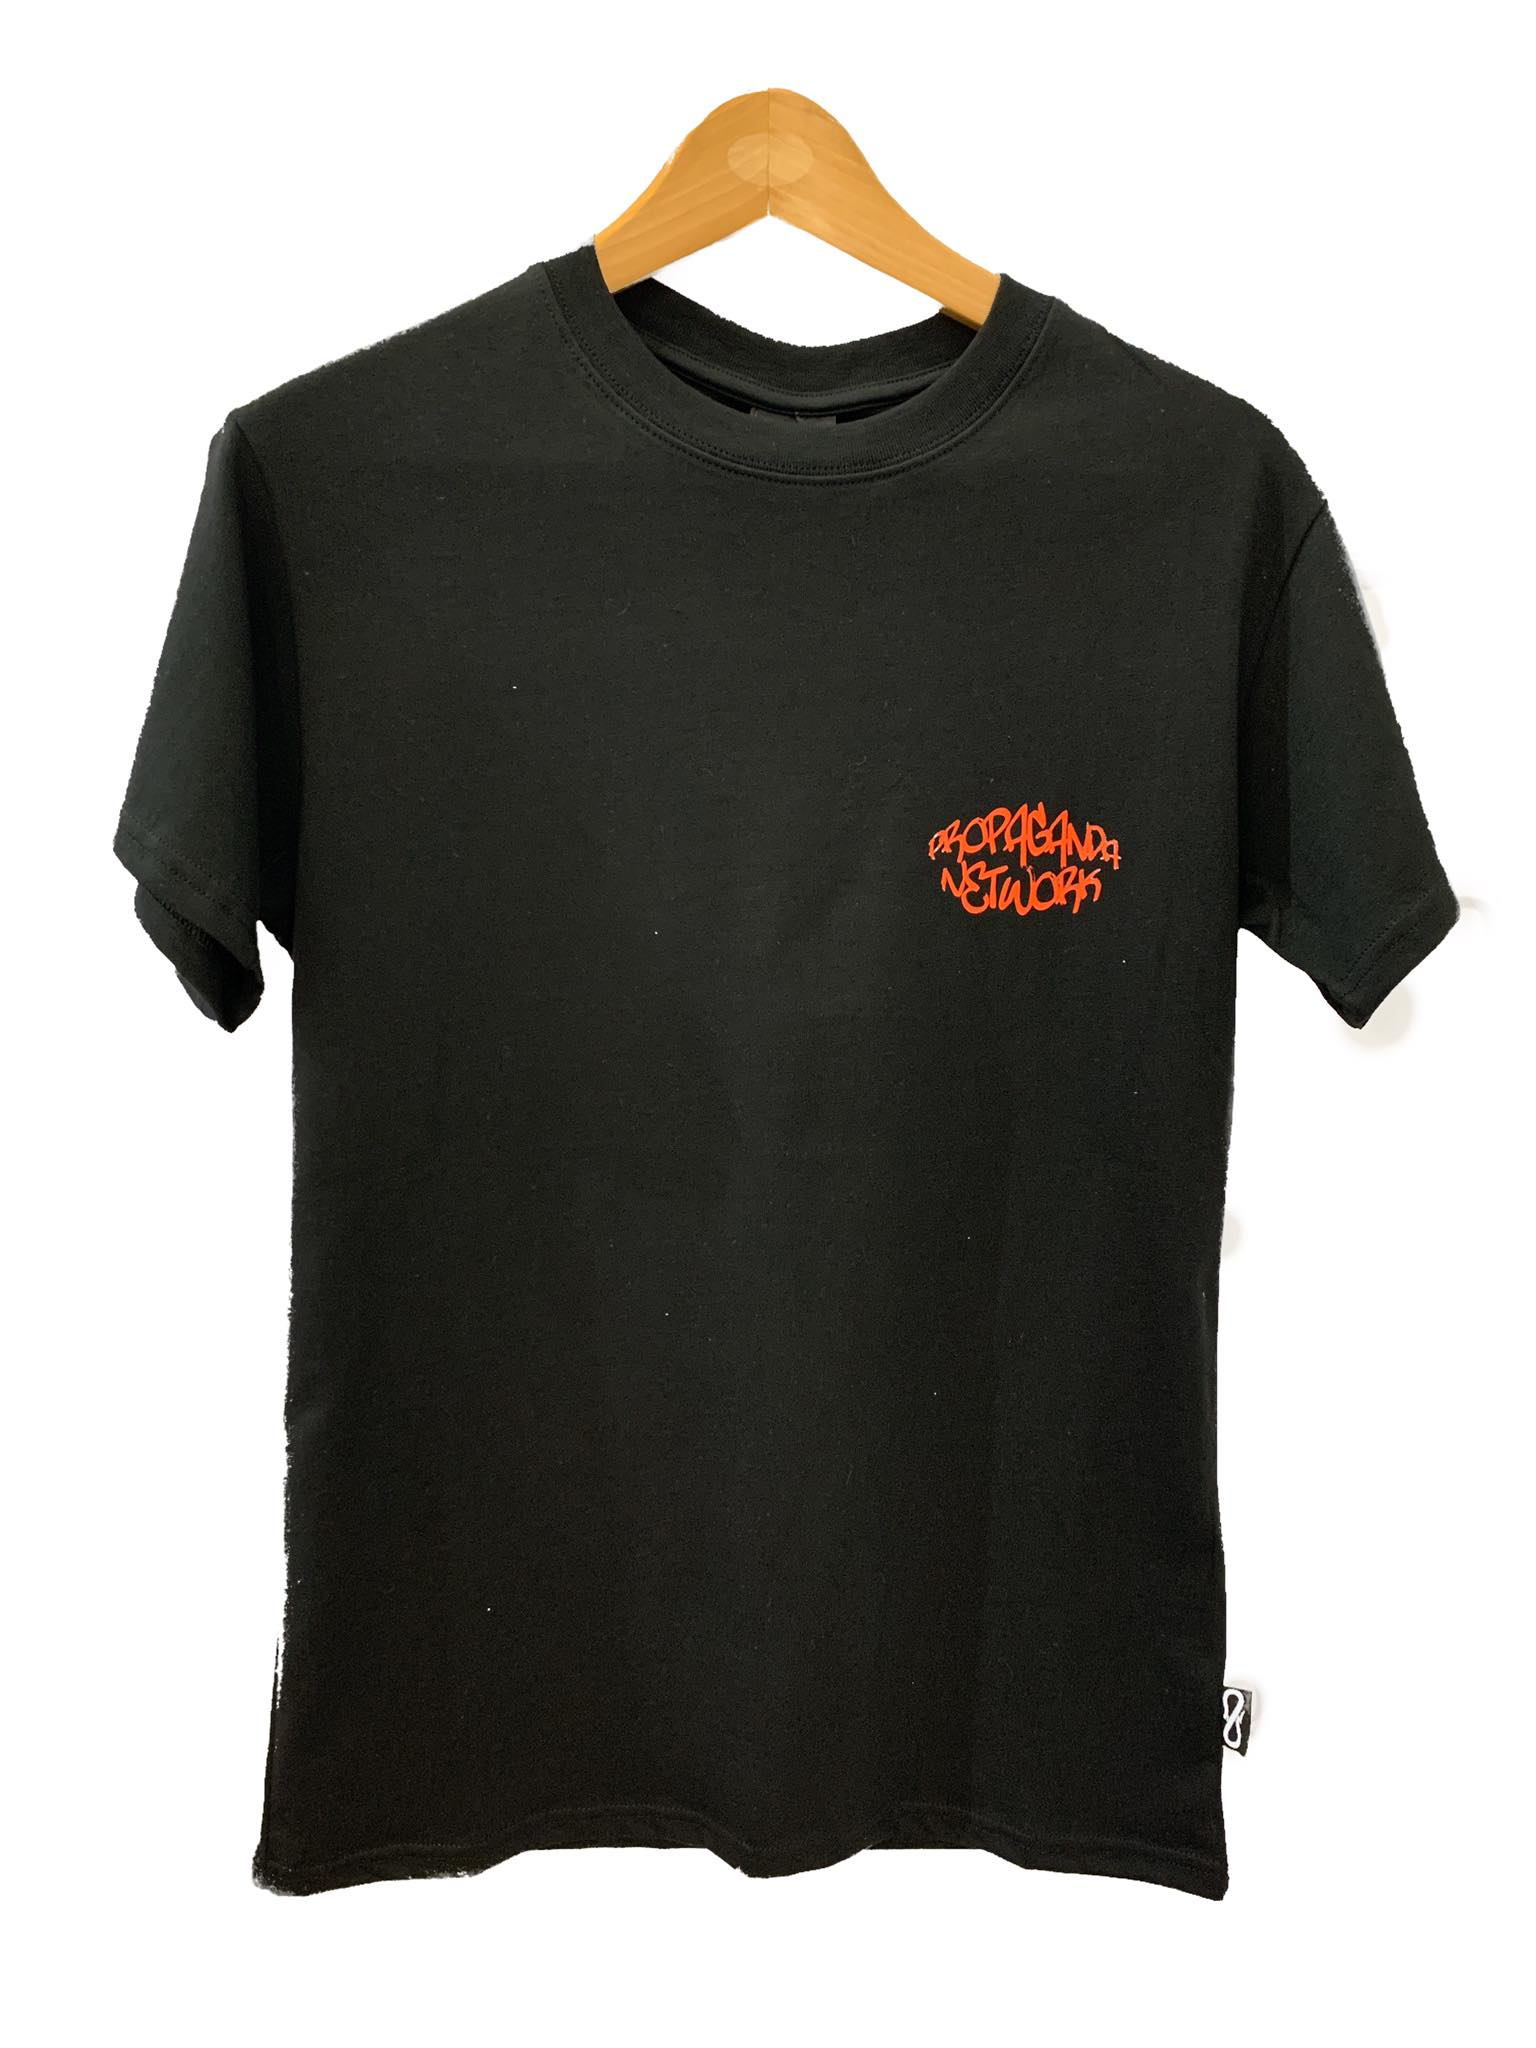 T-Shirt Propaganda Network Black